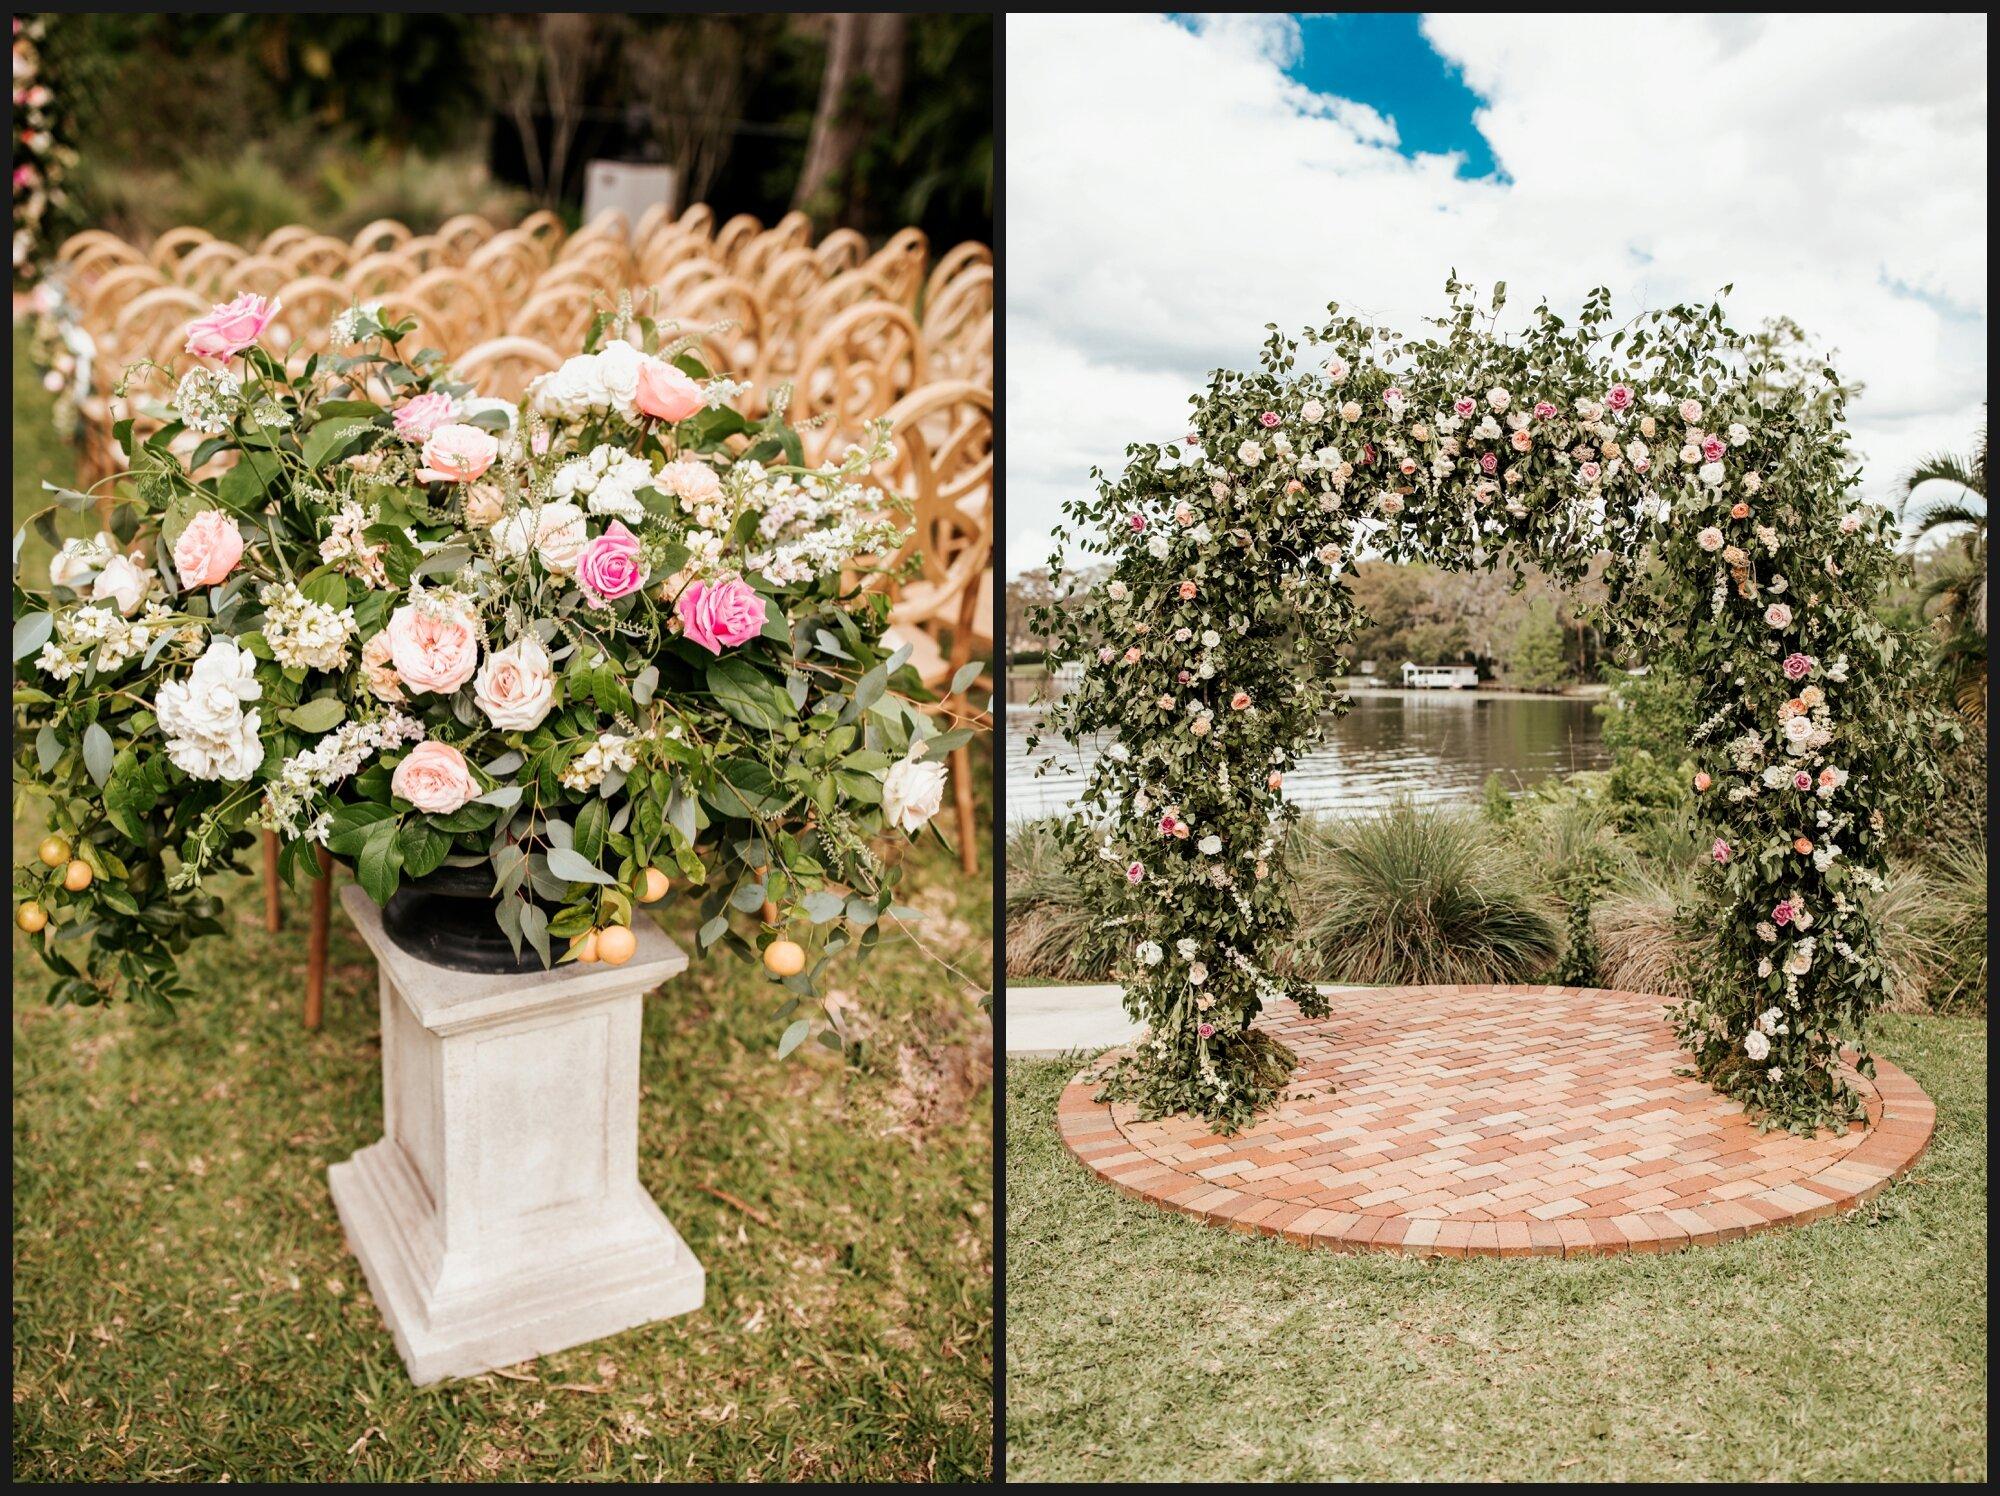 Orlando-Wedding-Photographer-destination-wedding-photographer-florida-wedding-photographer-hawaii-wedding-photographer_0706.jpg